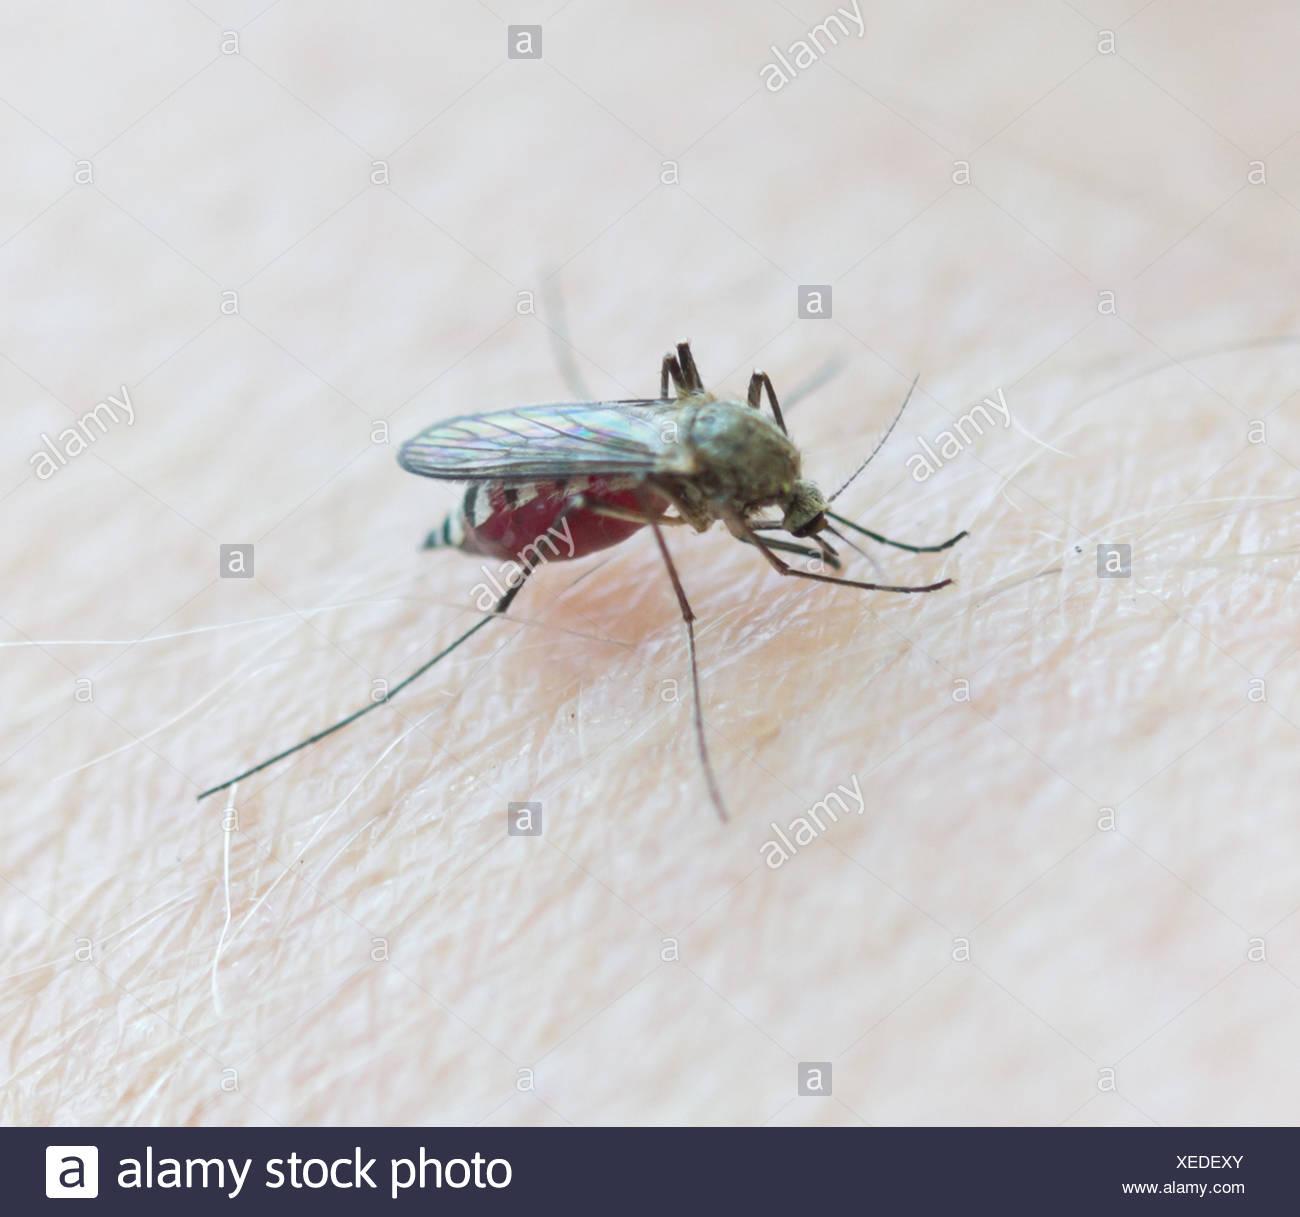 mosquito sucking blood - Stock Image